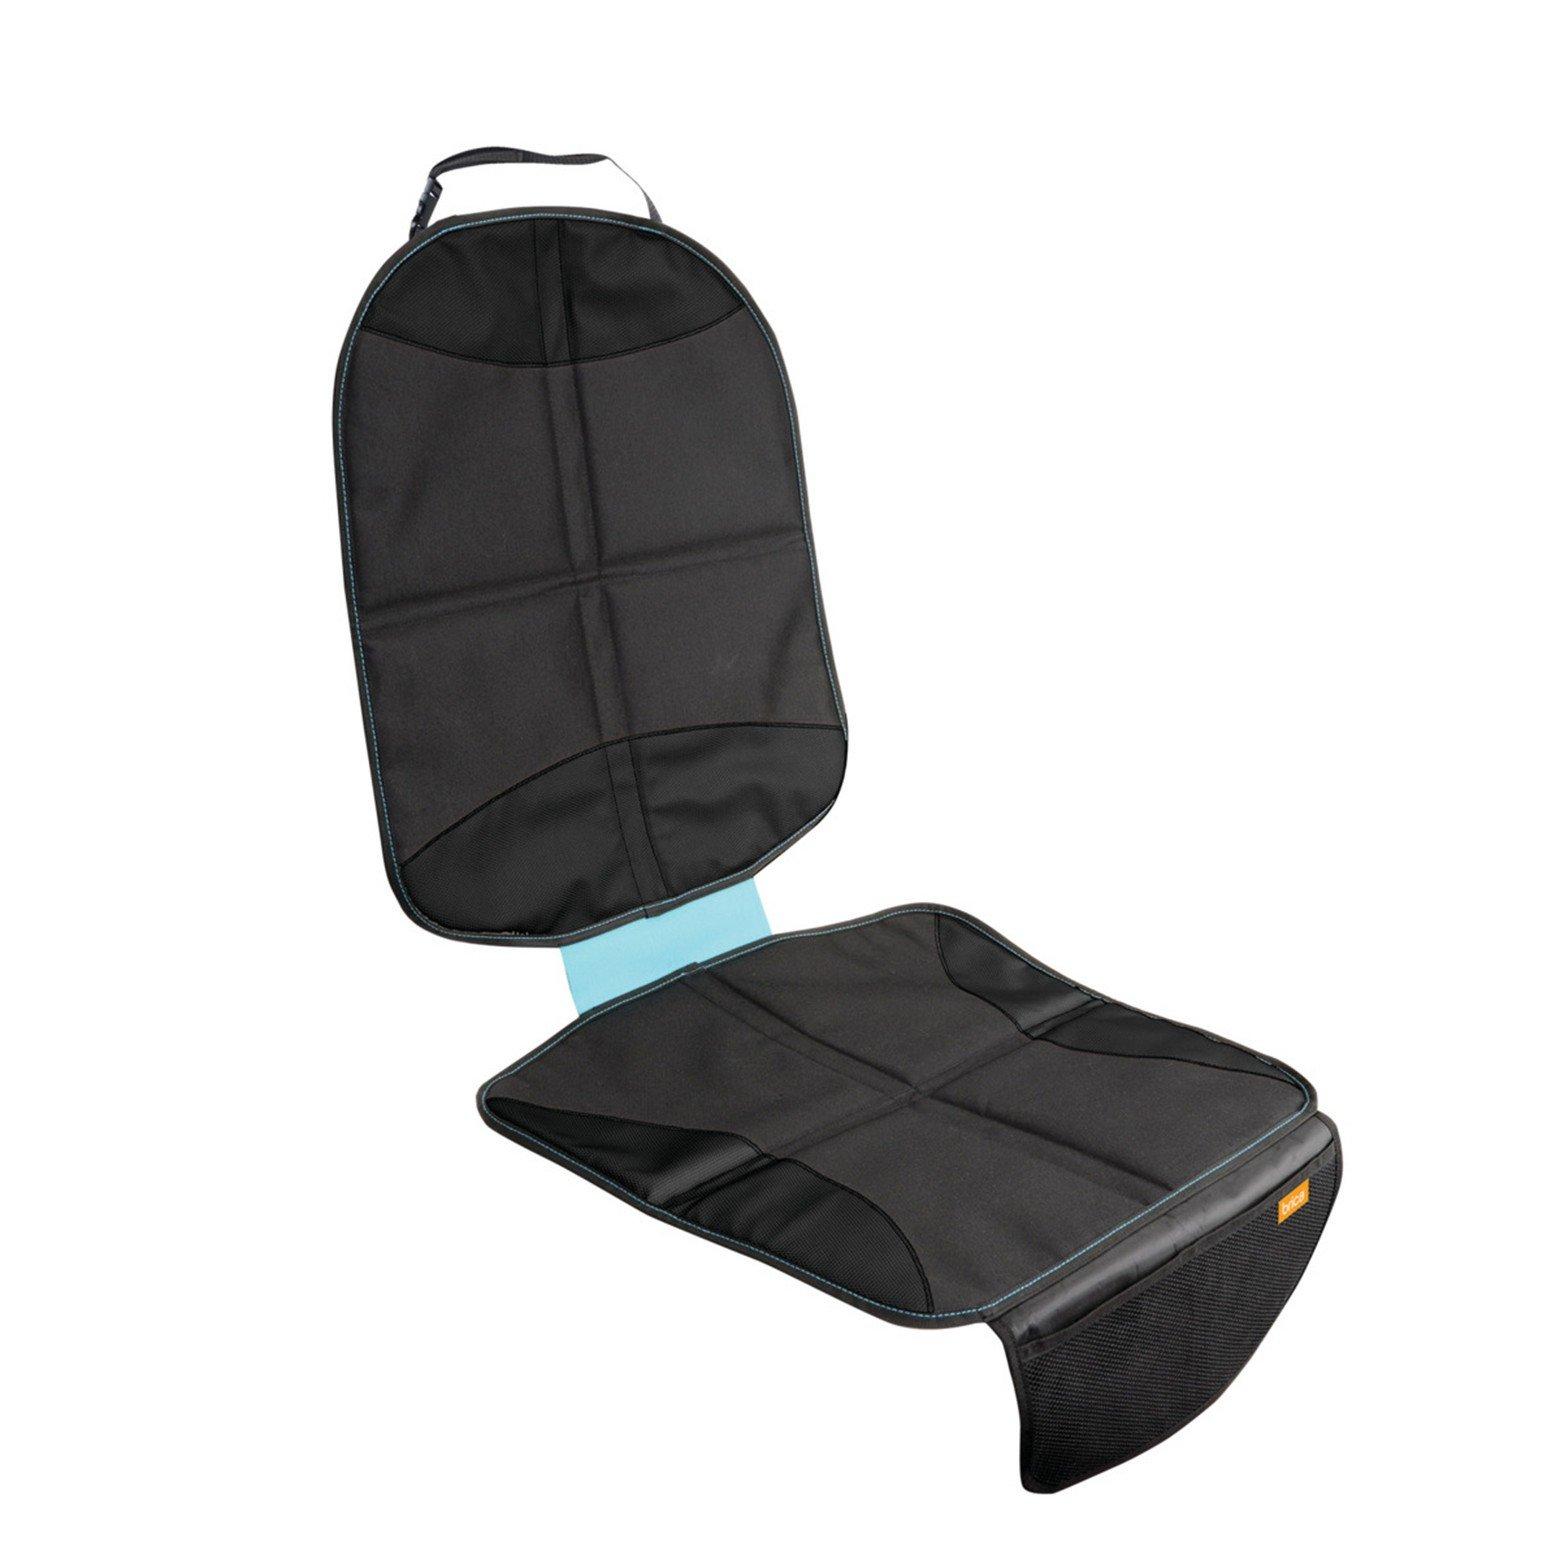 Brica Seat Guardian Car Seat Protector, 2 Count